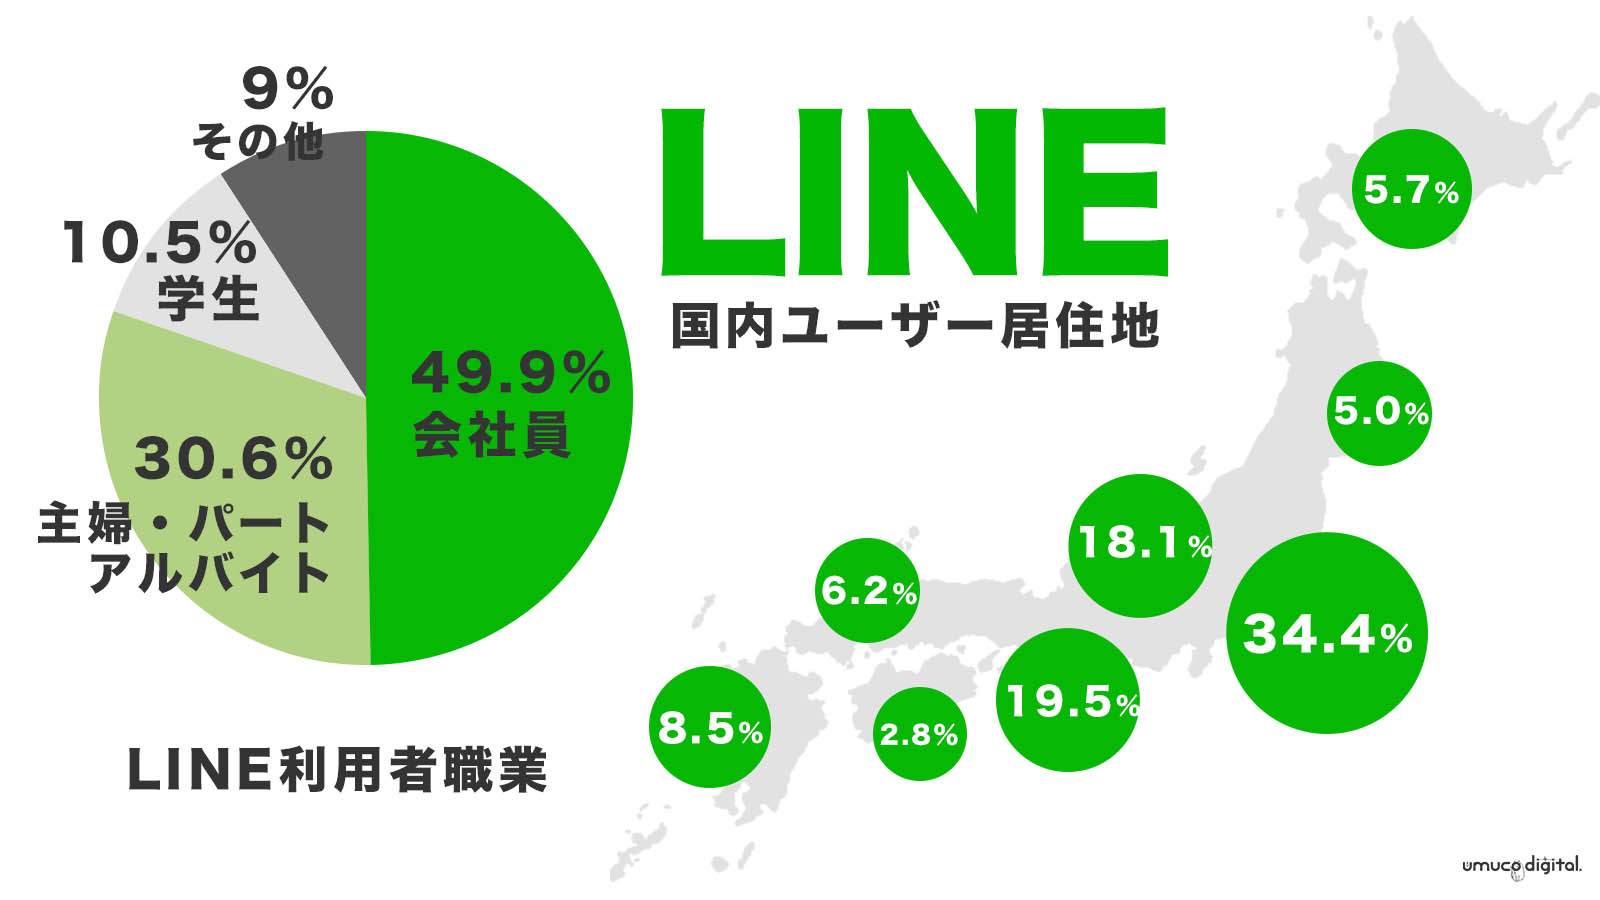 LINEt国内利用者数